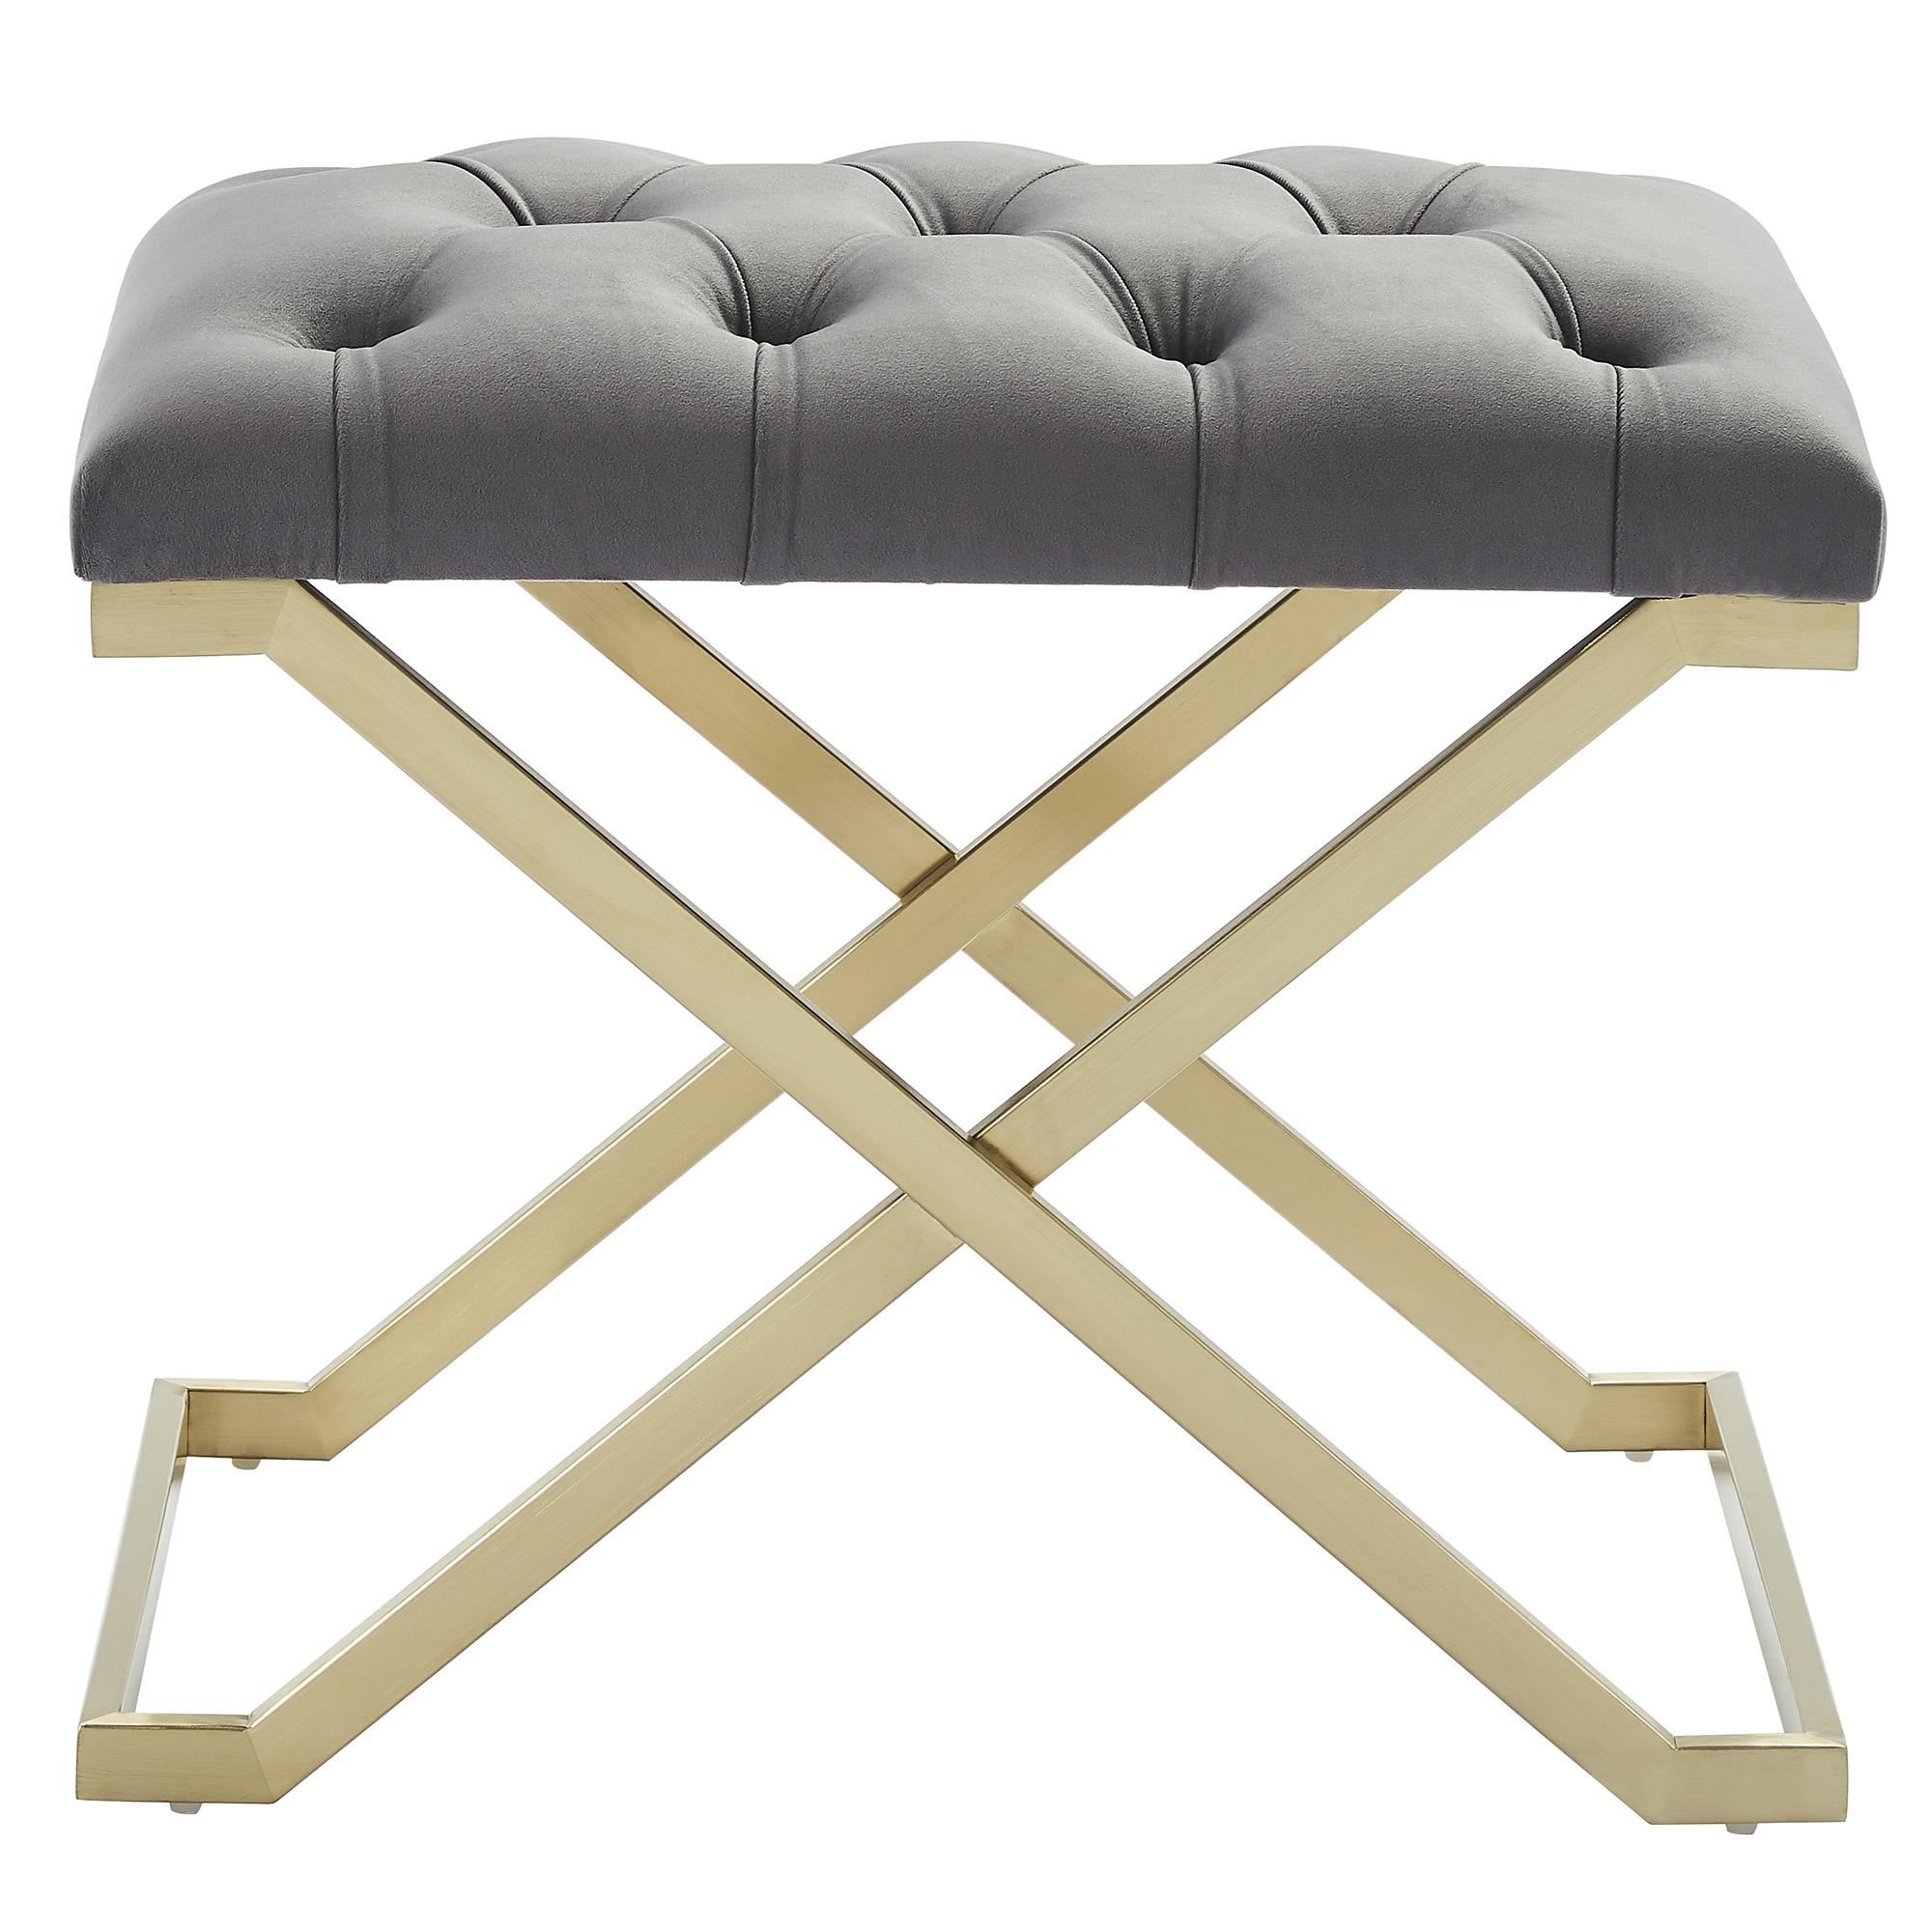 Contemporary Velvet & Stainless Steel Bench in Grey & Gold